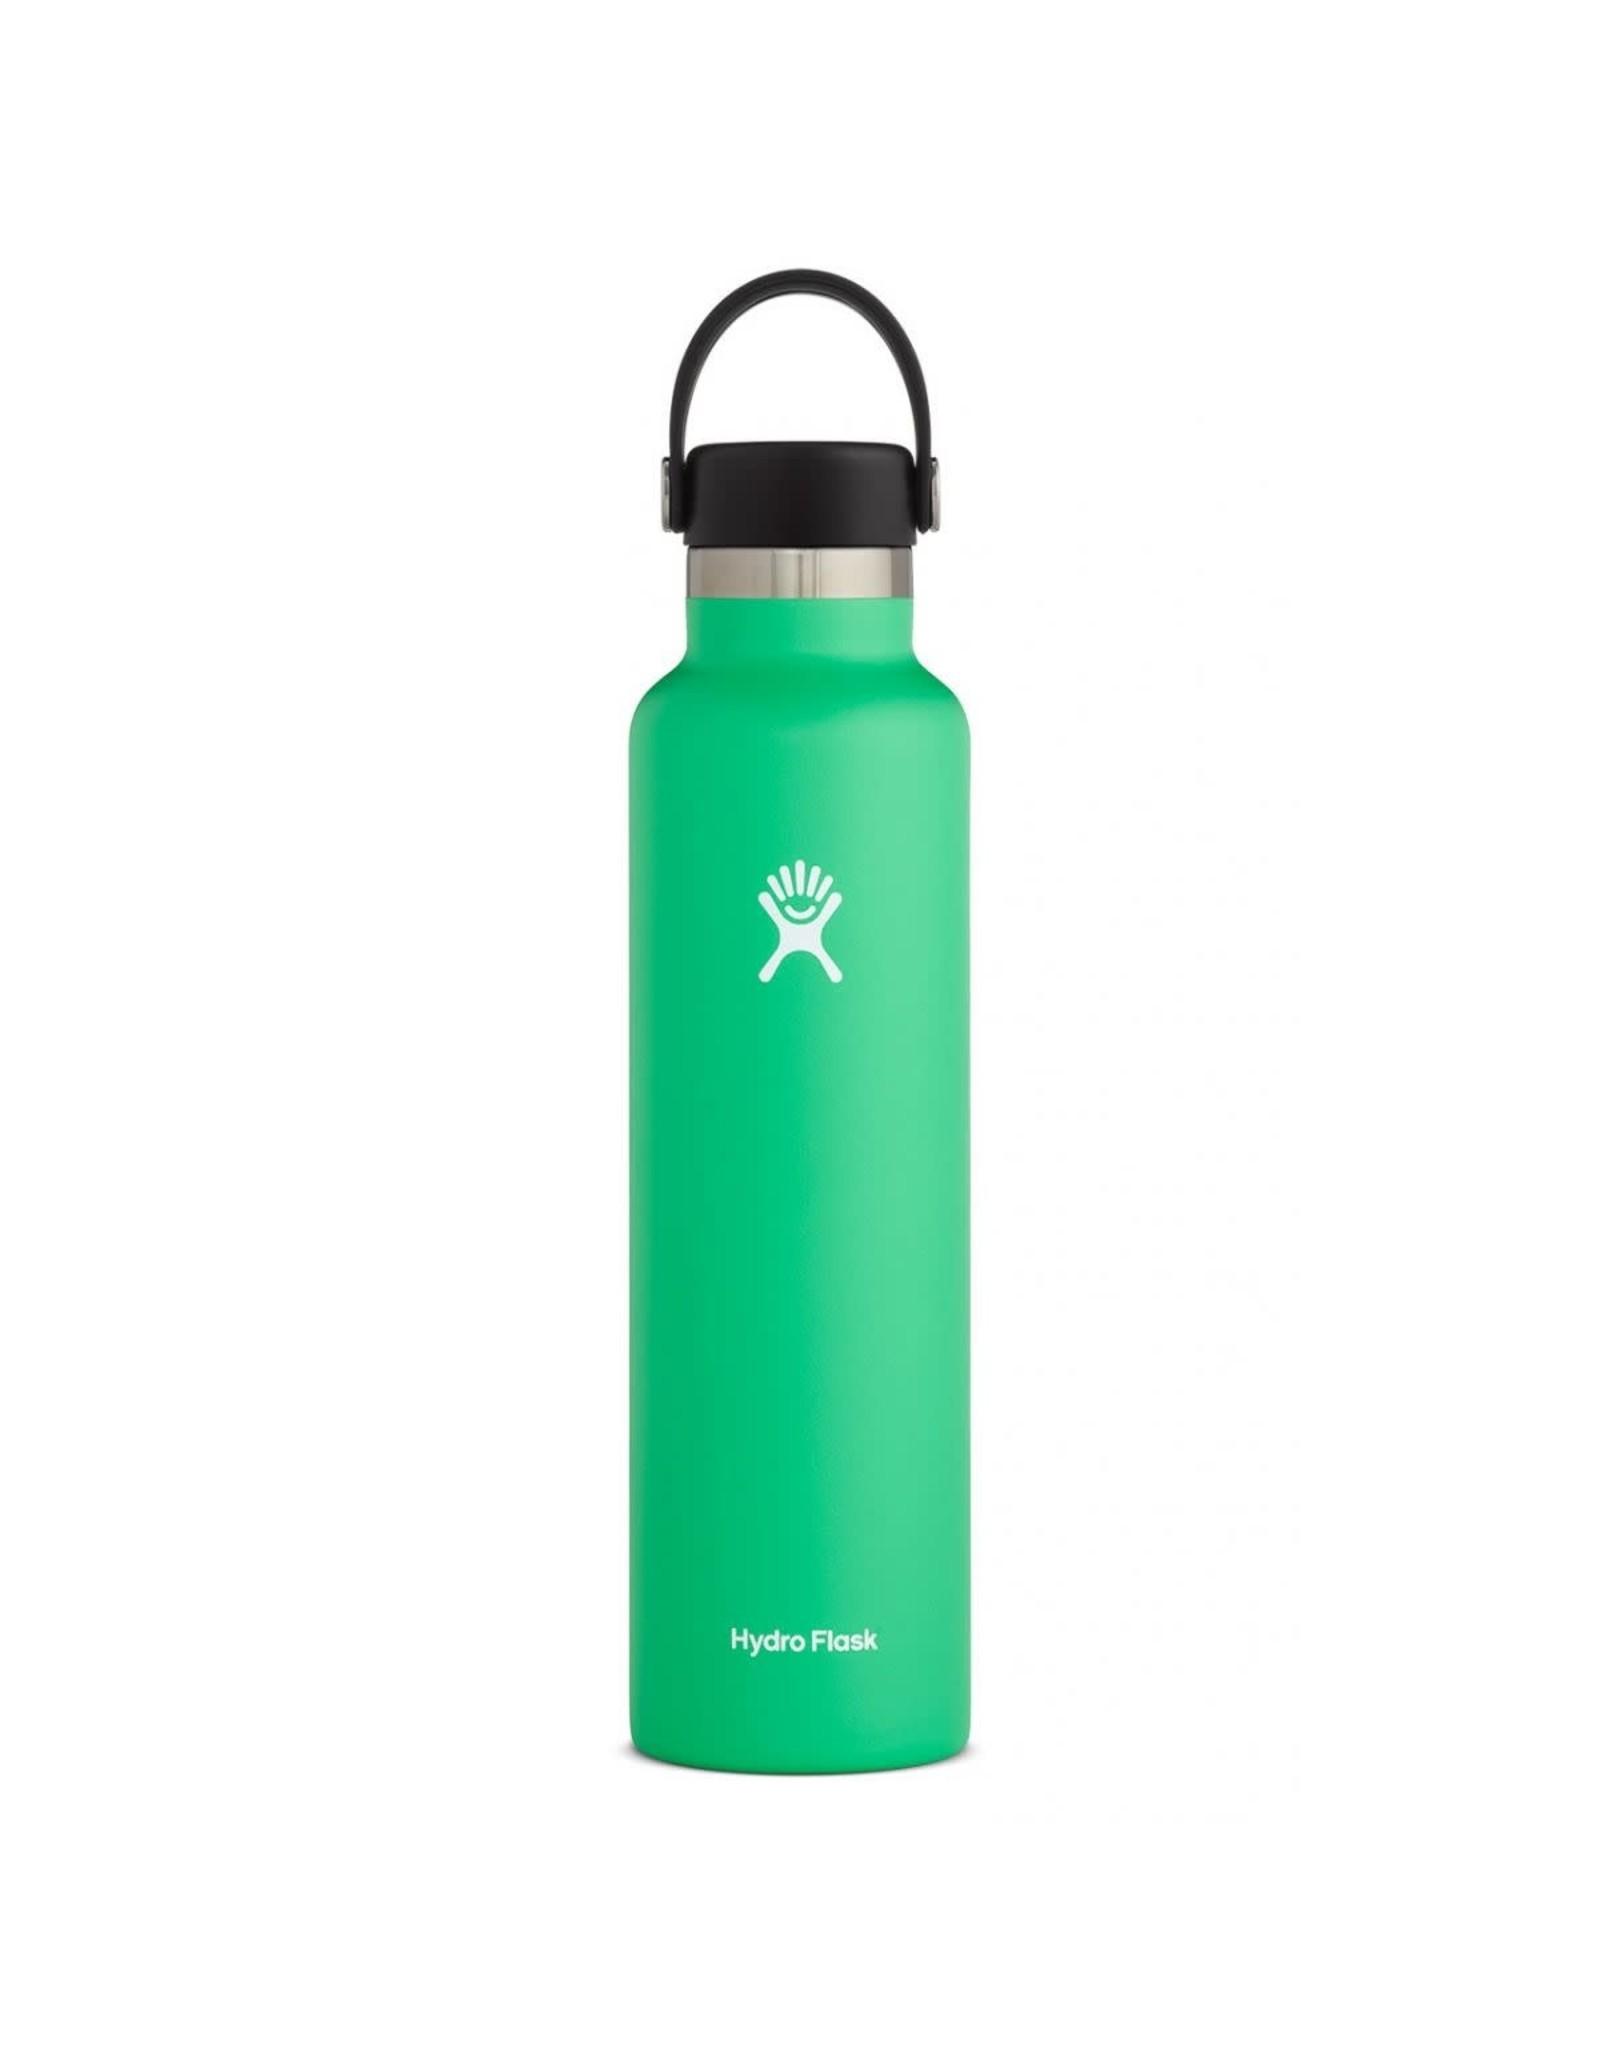 Hydro Flask Hydro Flask 24oz Standard Mouth with Flex Cap Spearmint